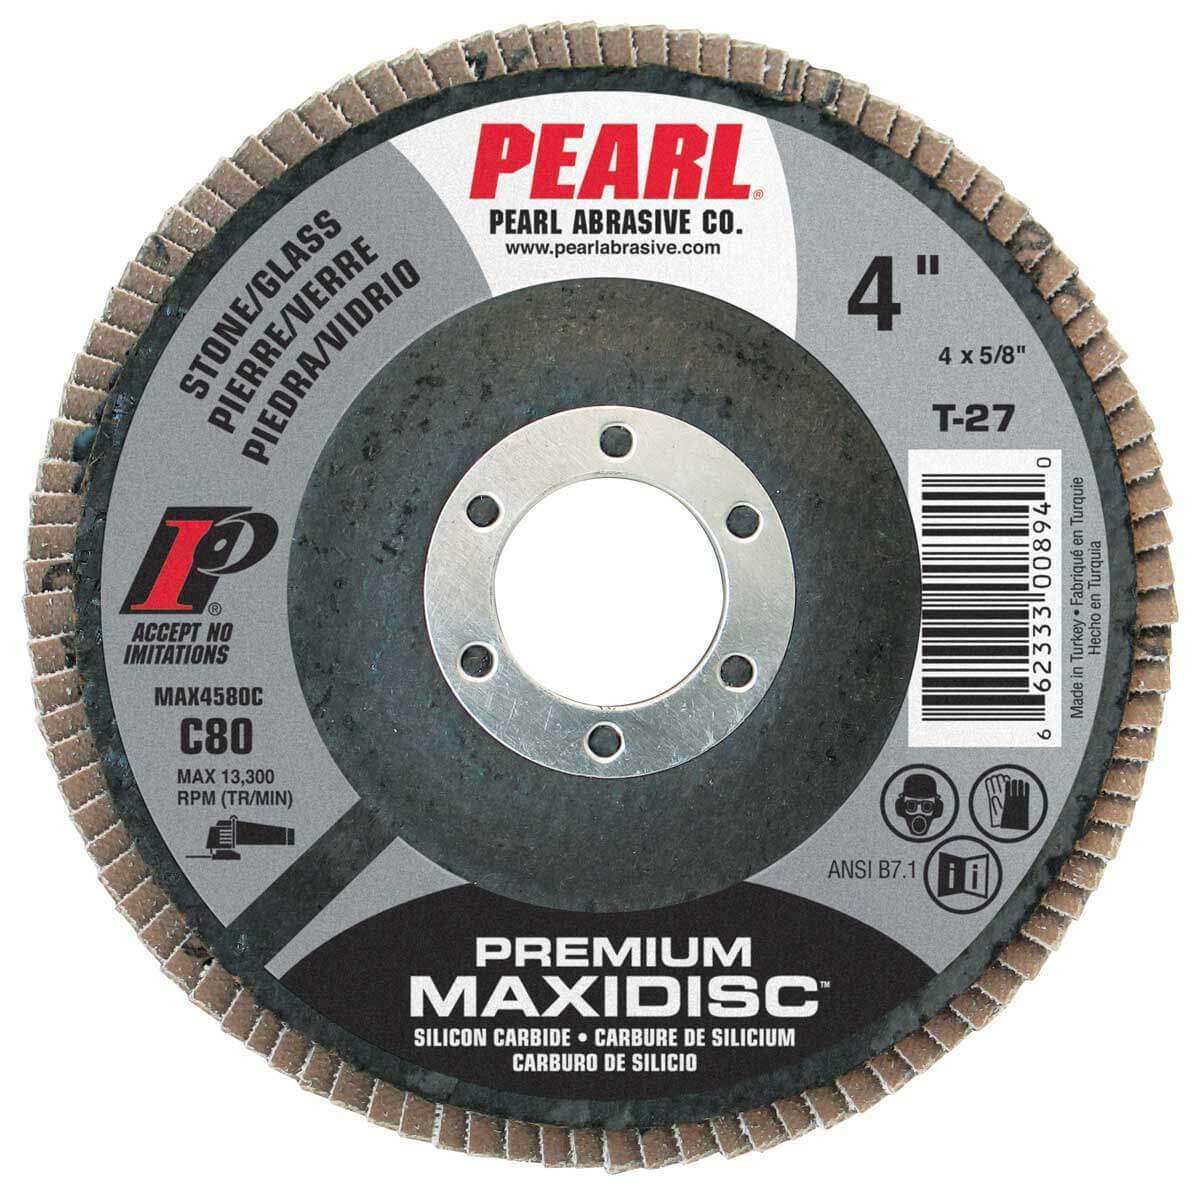 Pearl 4 inch Maxi Disc Carbide Sanding Discs